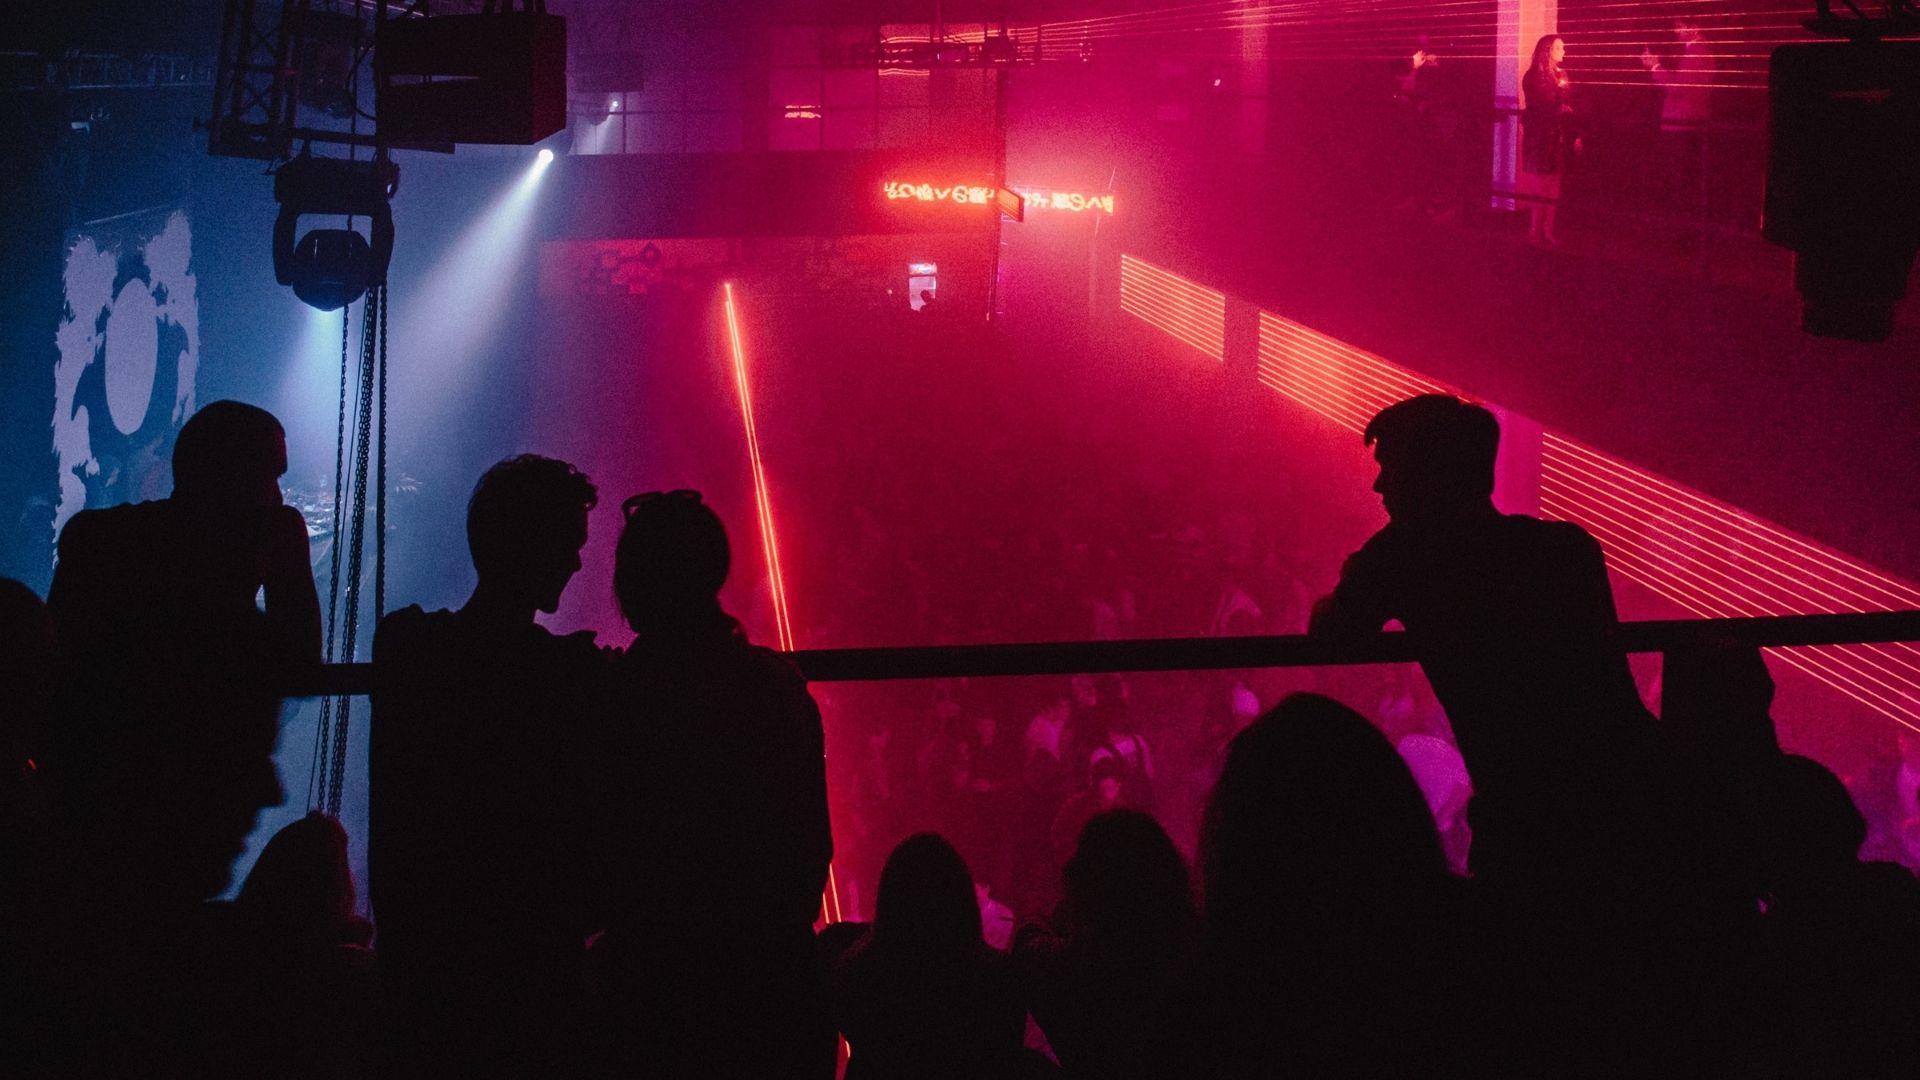 oci nocturn joves discoteca